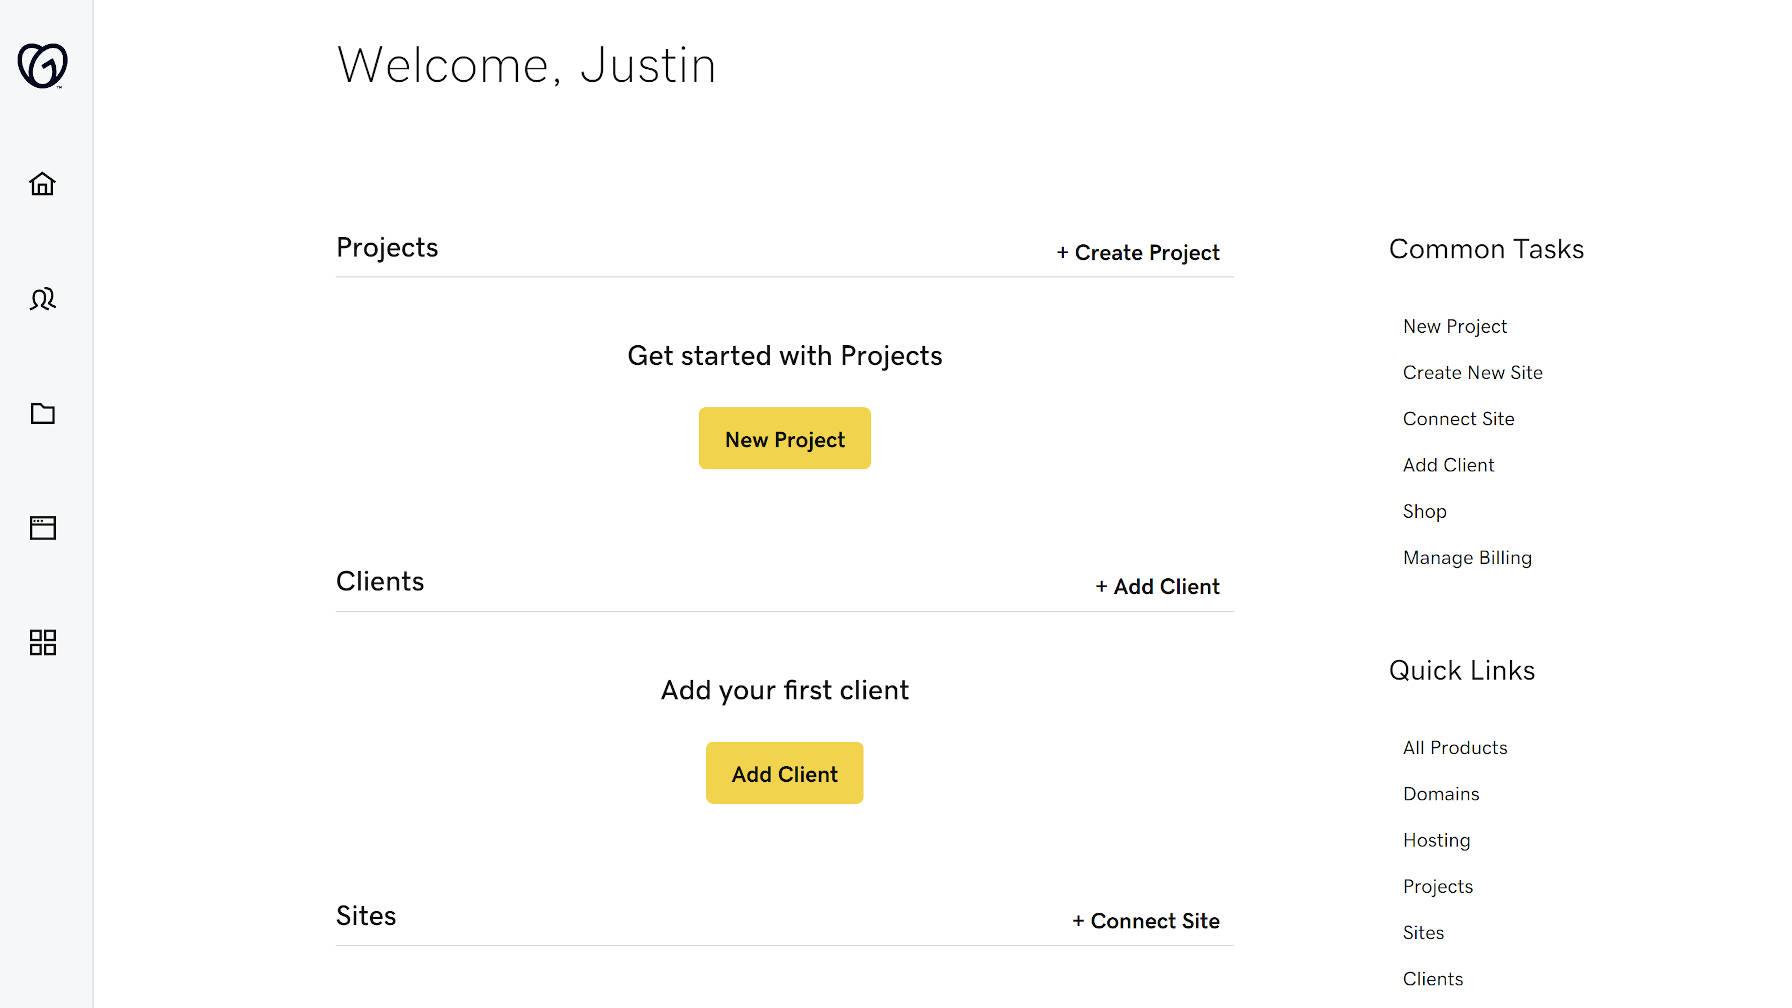 godaddy推出了一个新站点项目和客户端管理经验的网站专业人员1 GoDaddy推出了针对Web专业人员的中心,新站点,项目和客户端管理体验